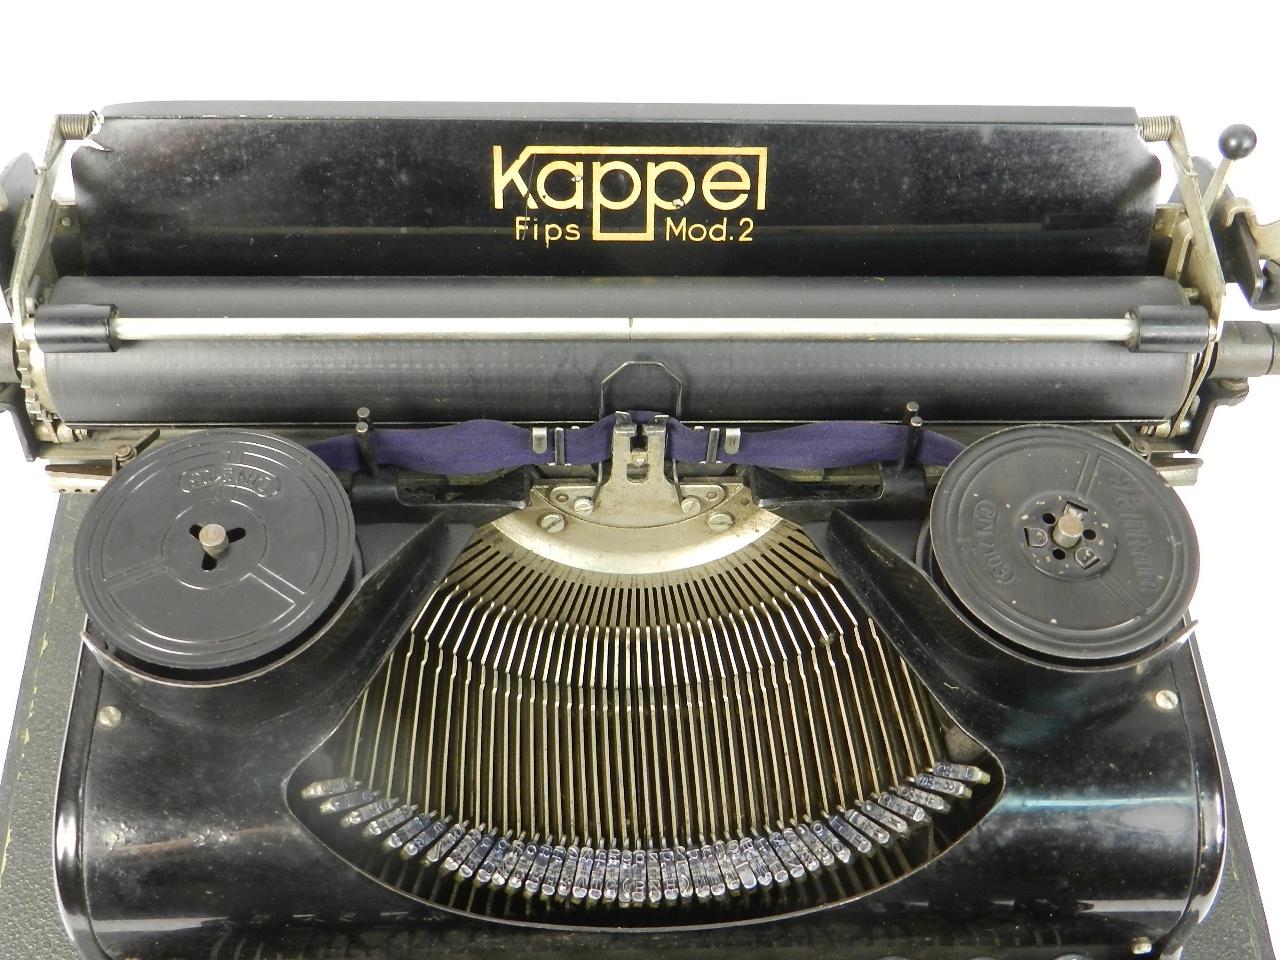 Imagen KAPPEL FIPS MOD.2  AÑO 1930 40024